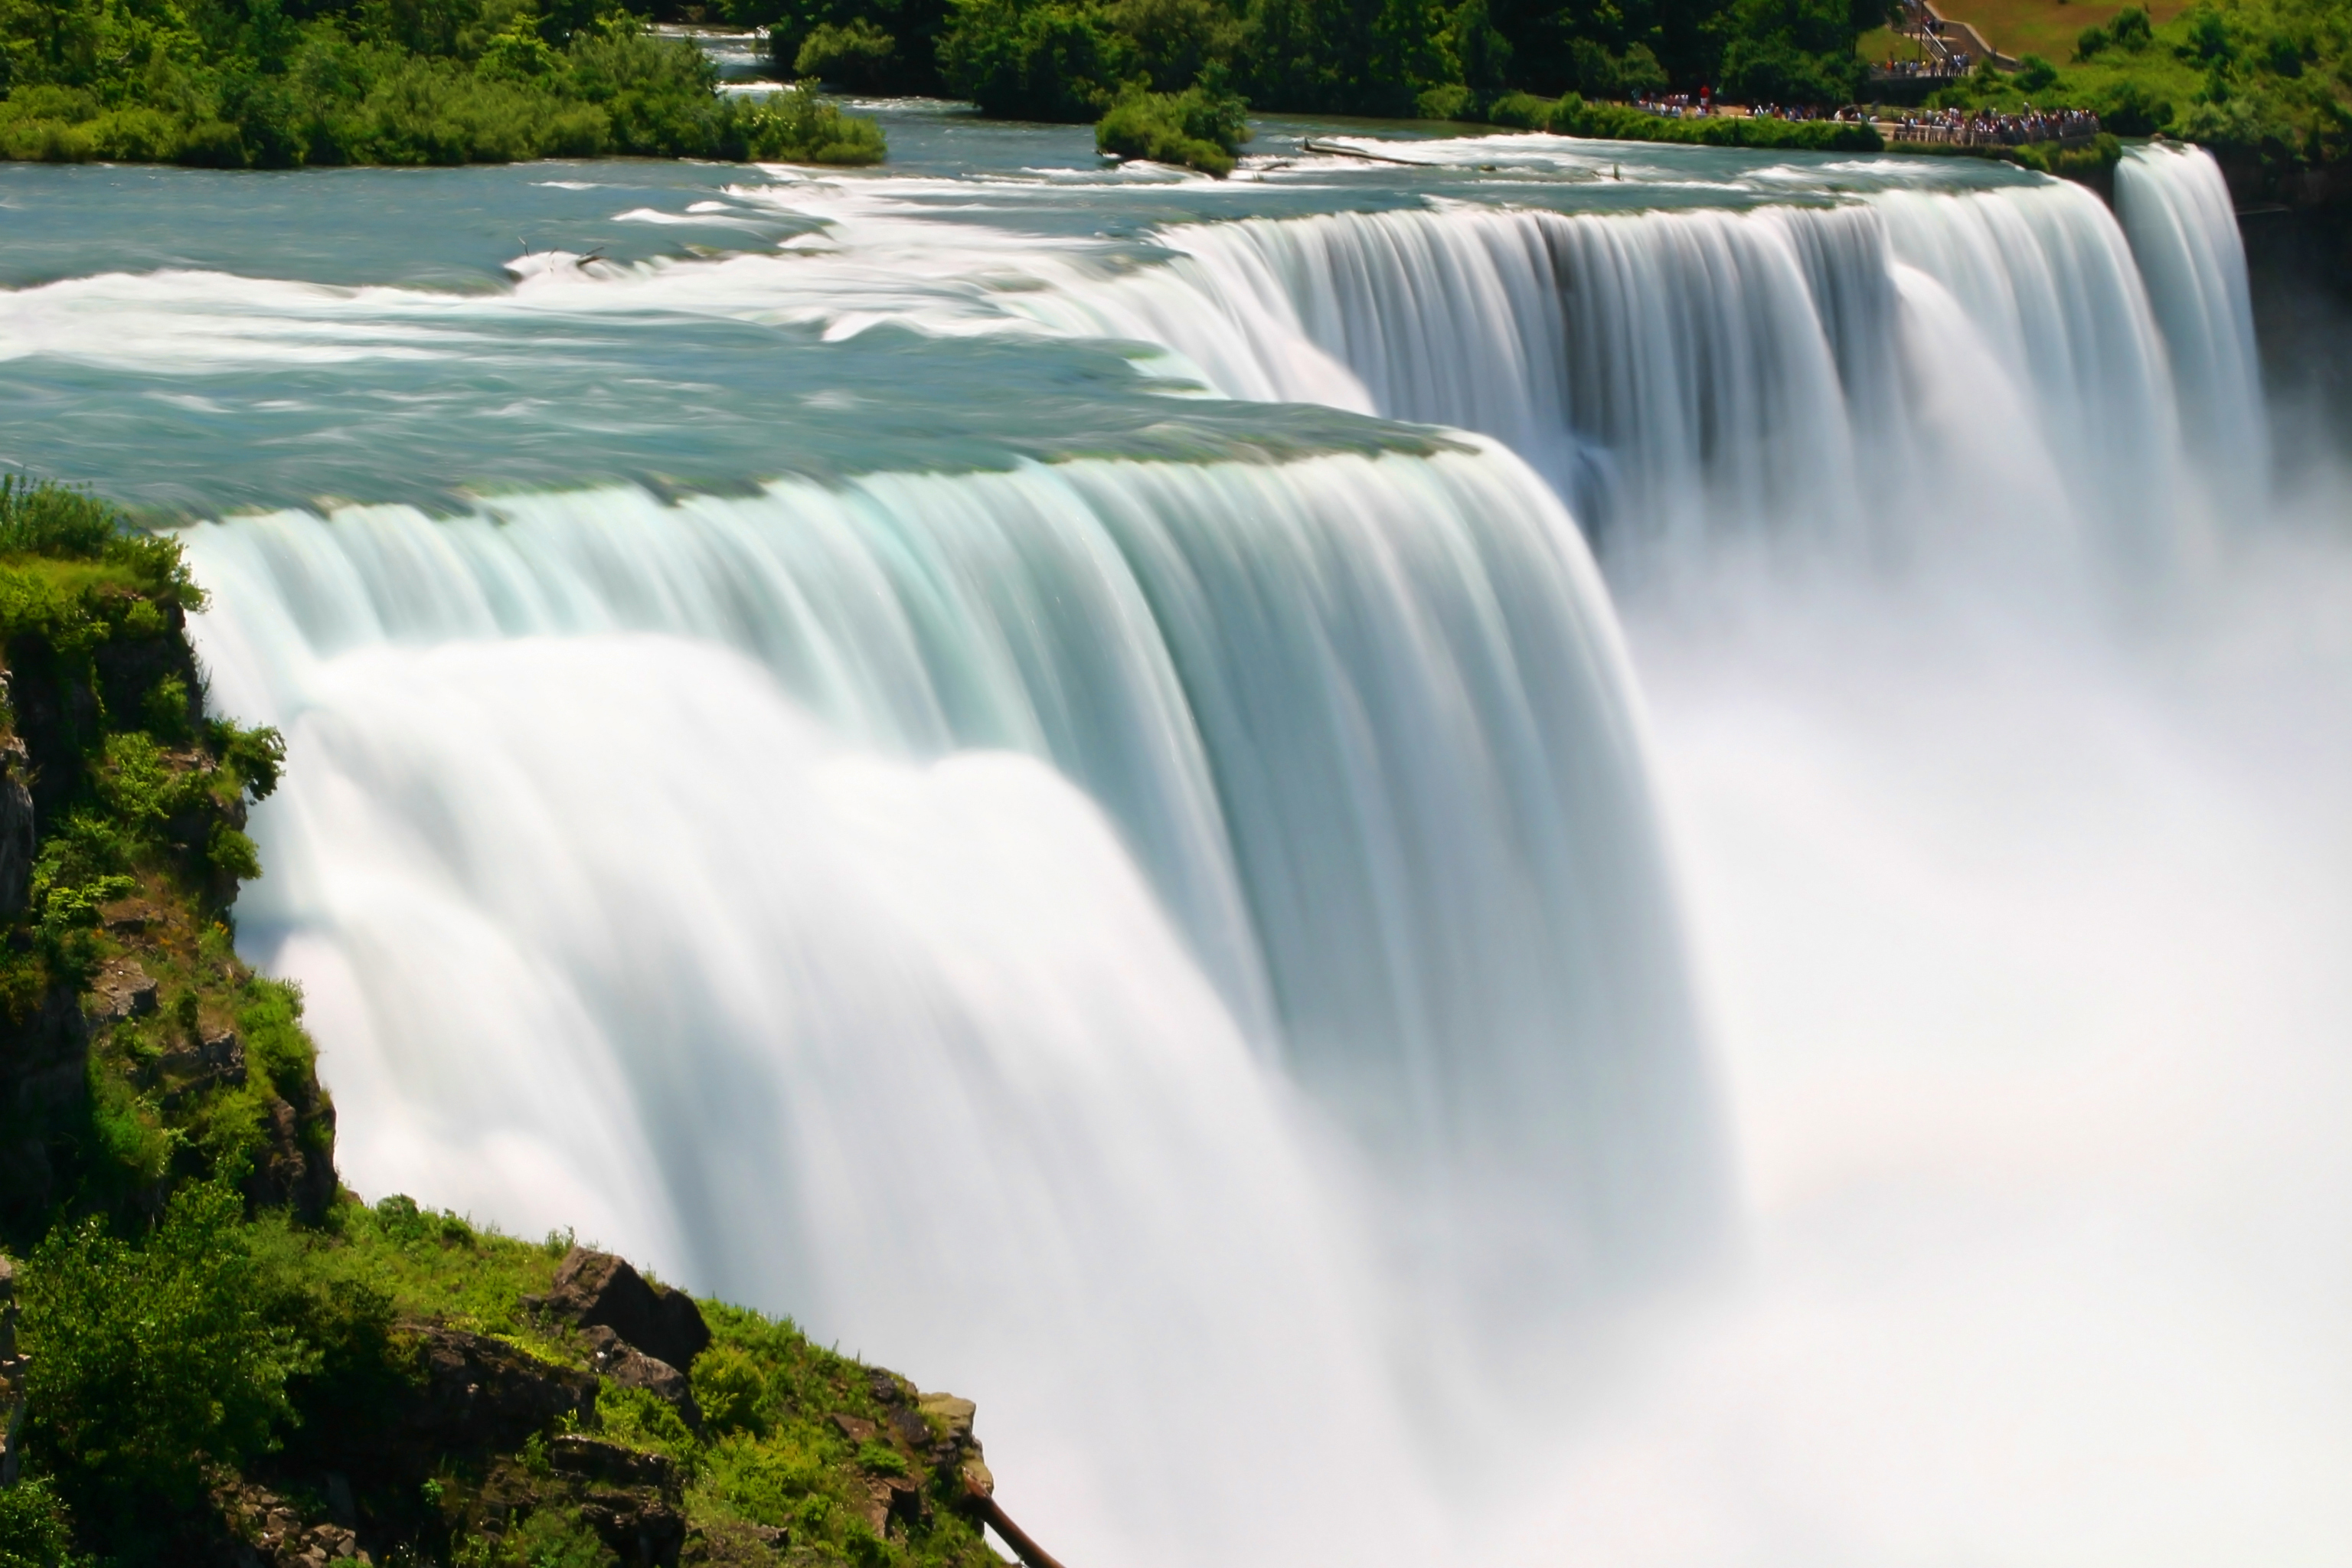 3. niagara falls